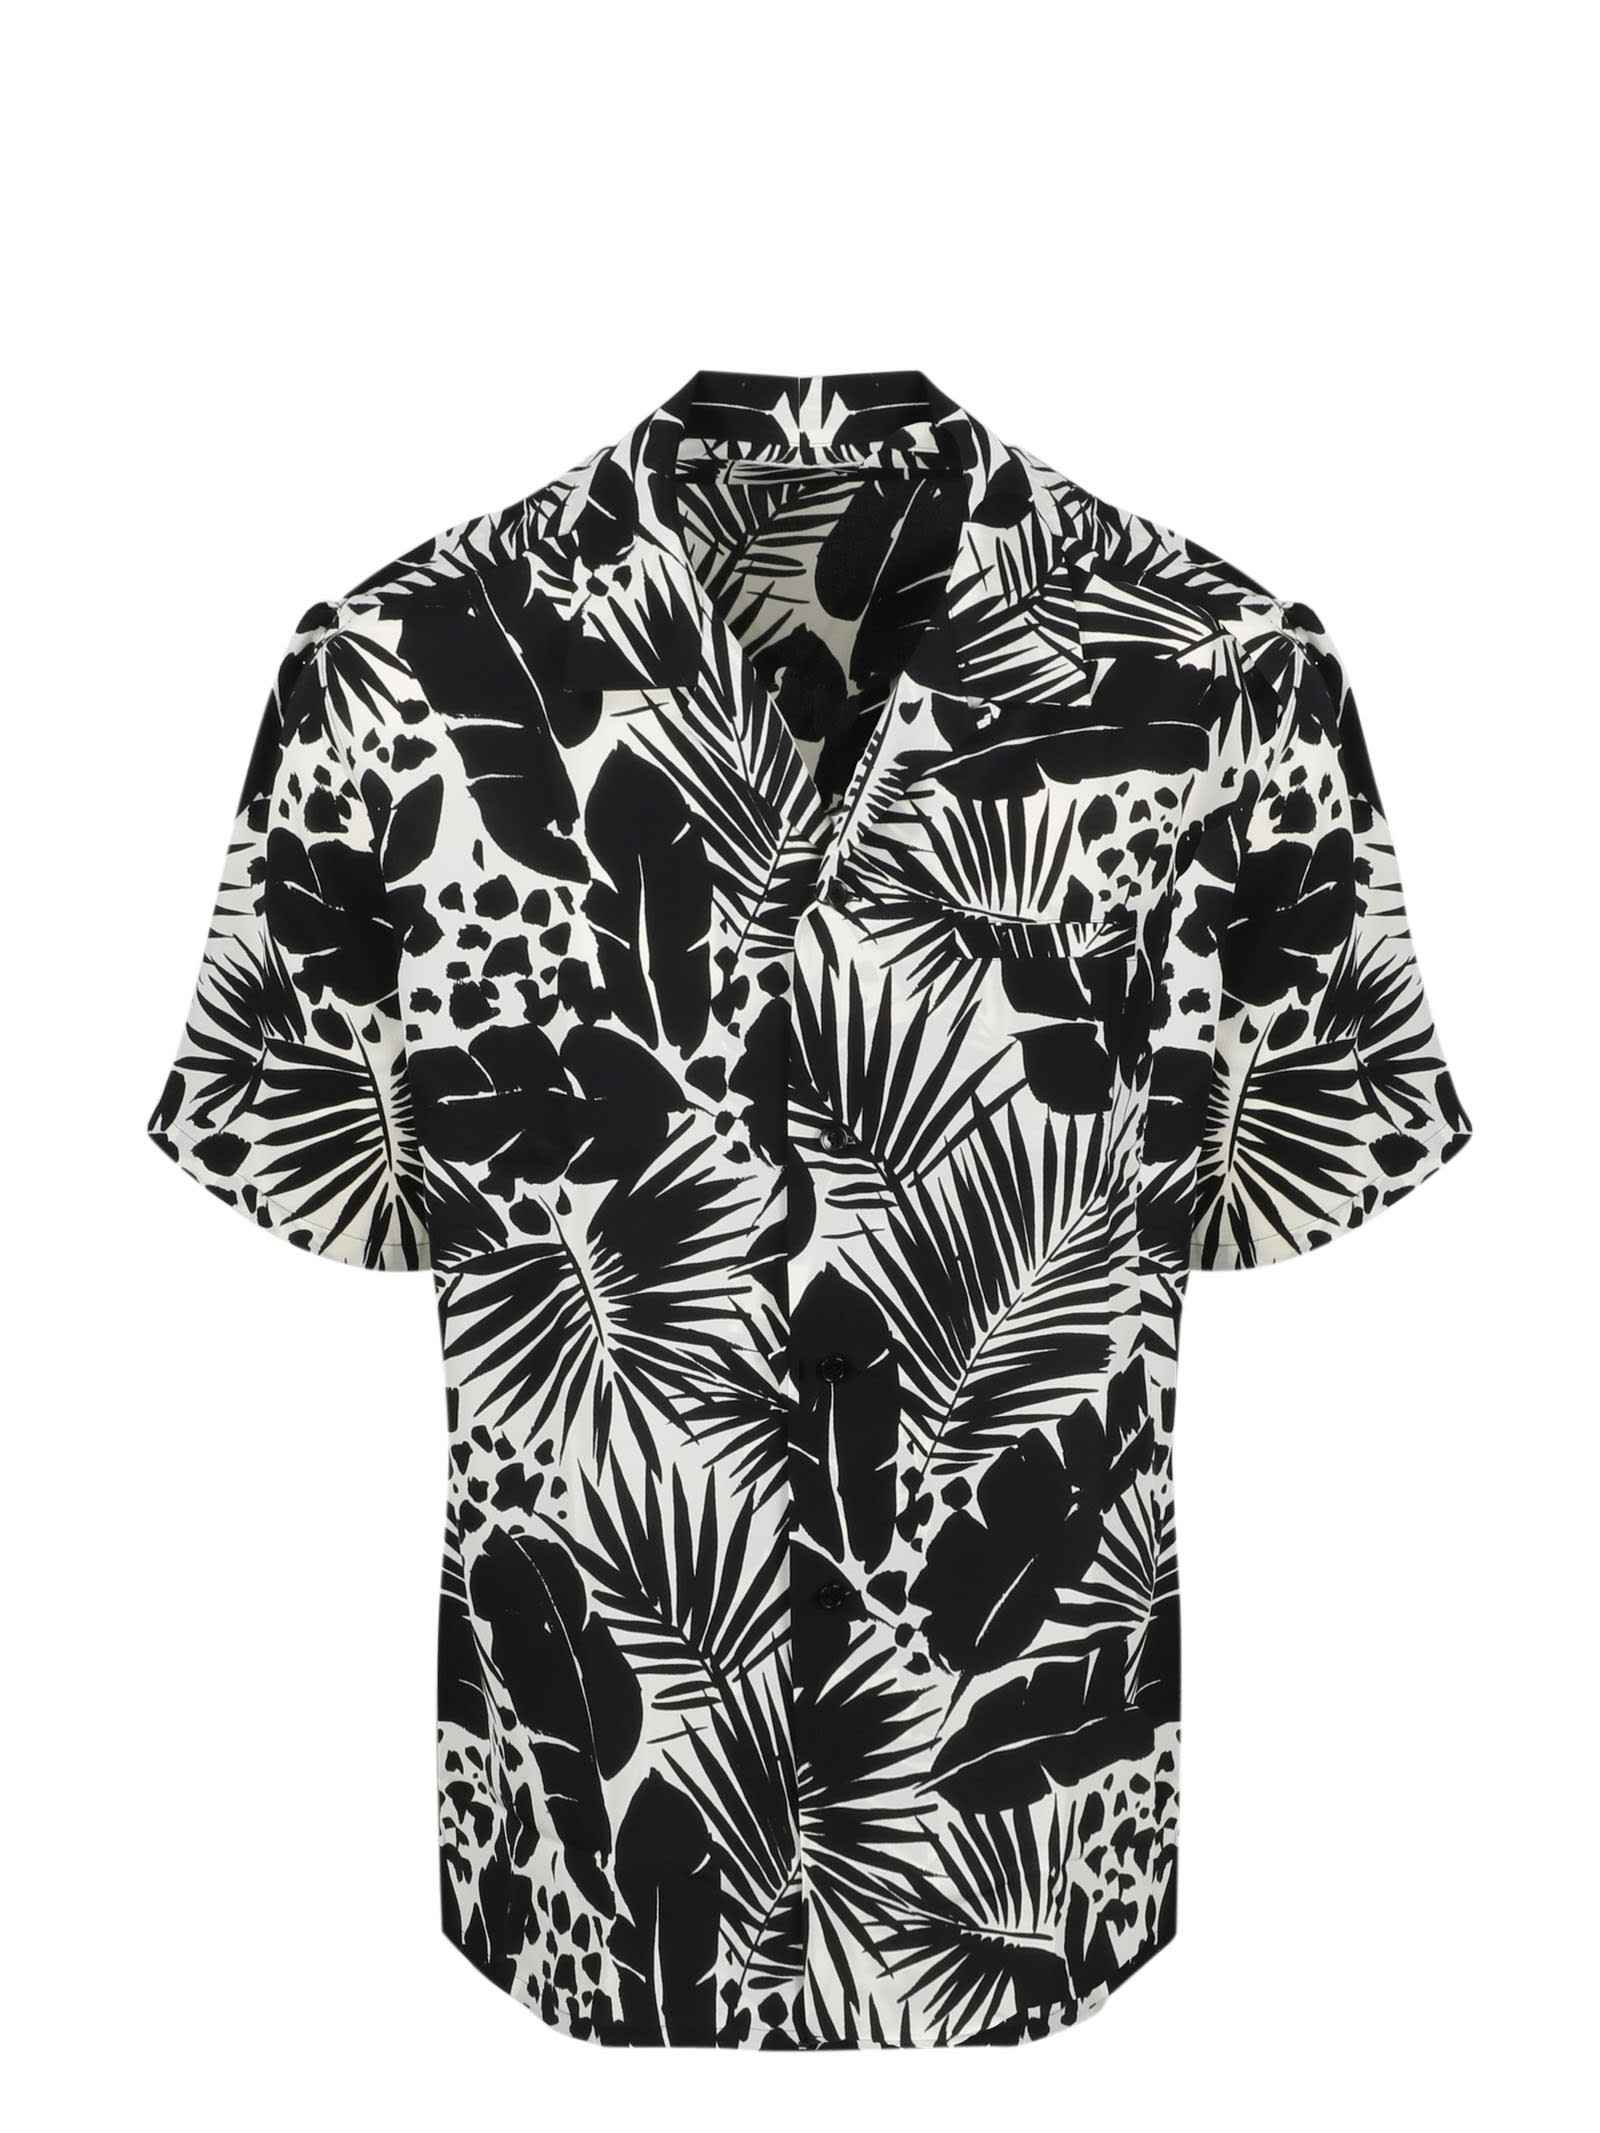 Saint Laurent Printed Silk Shirt